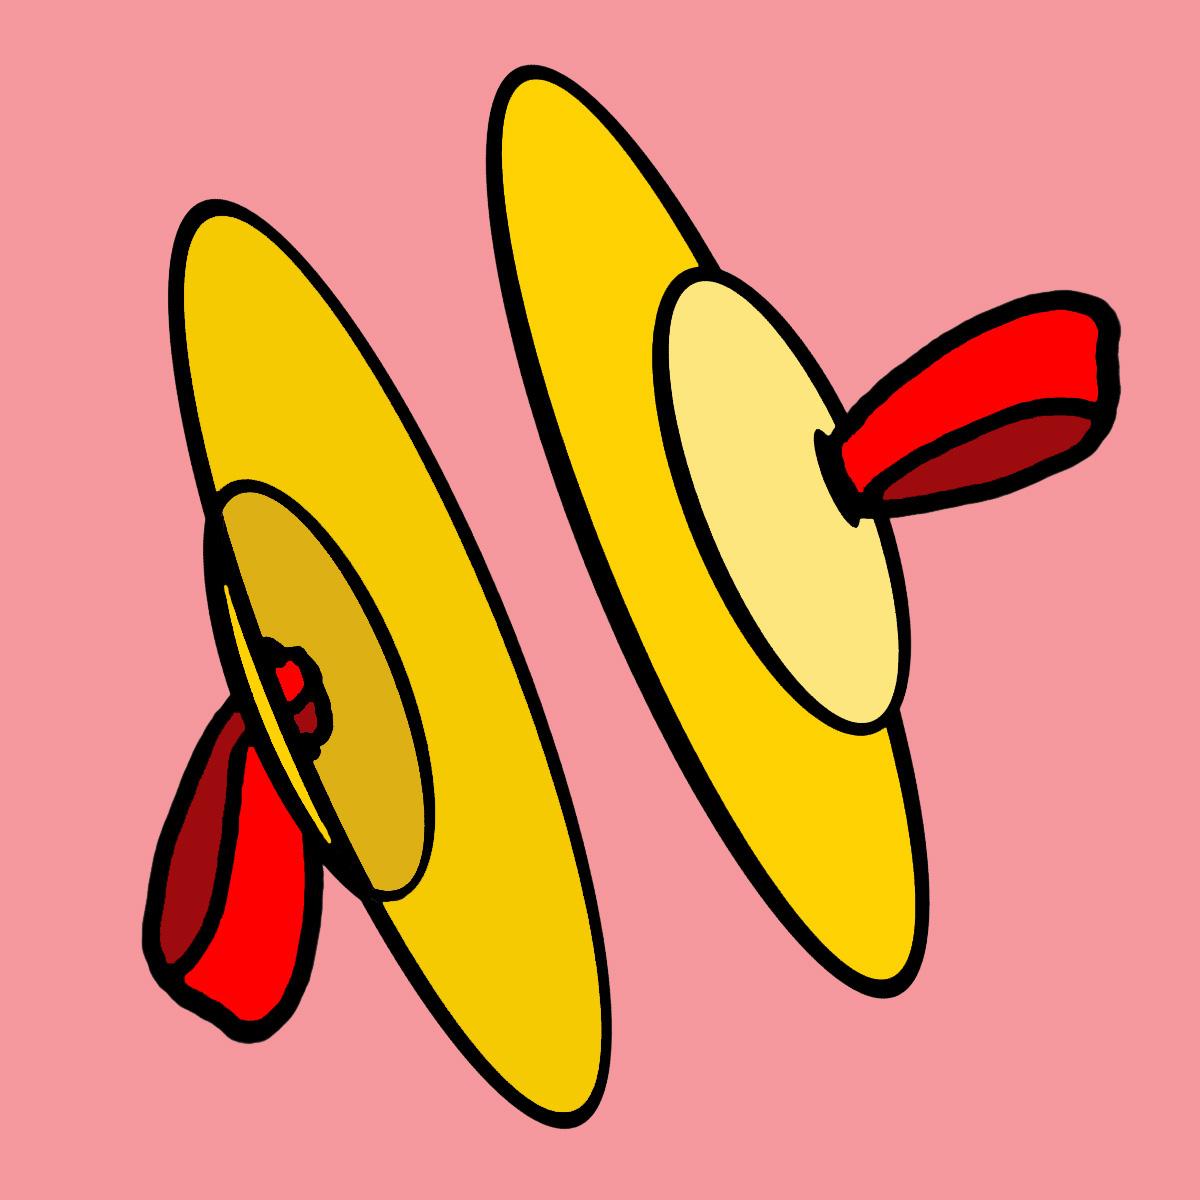 Musician clipart banquet Clipart 115 Clipart Clipart Marimba